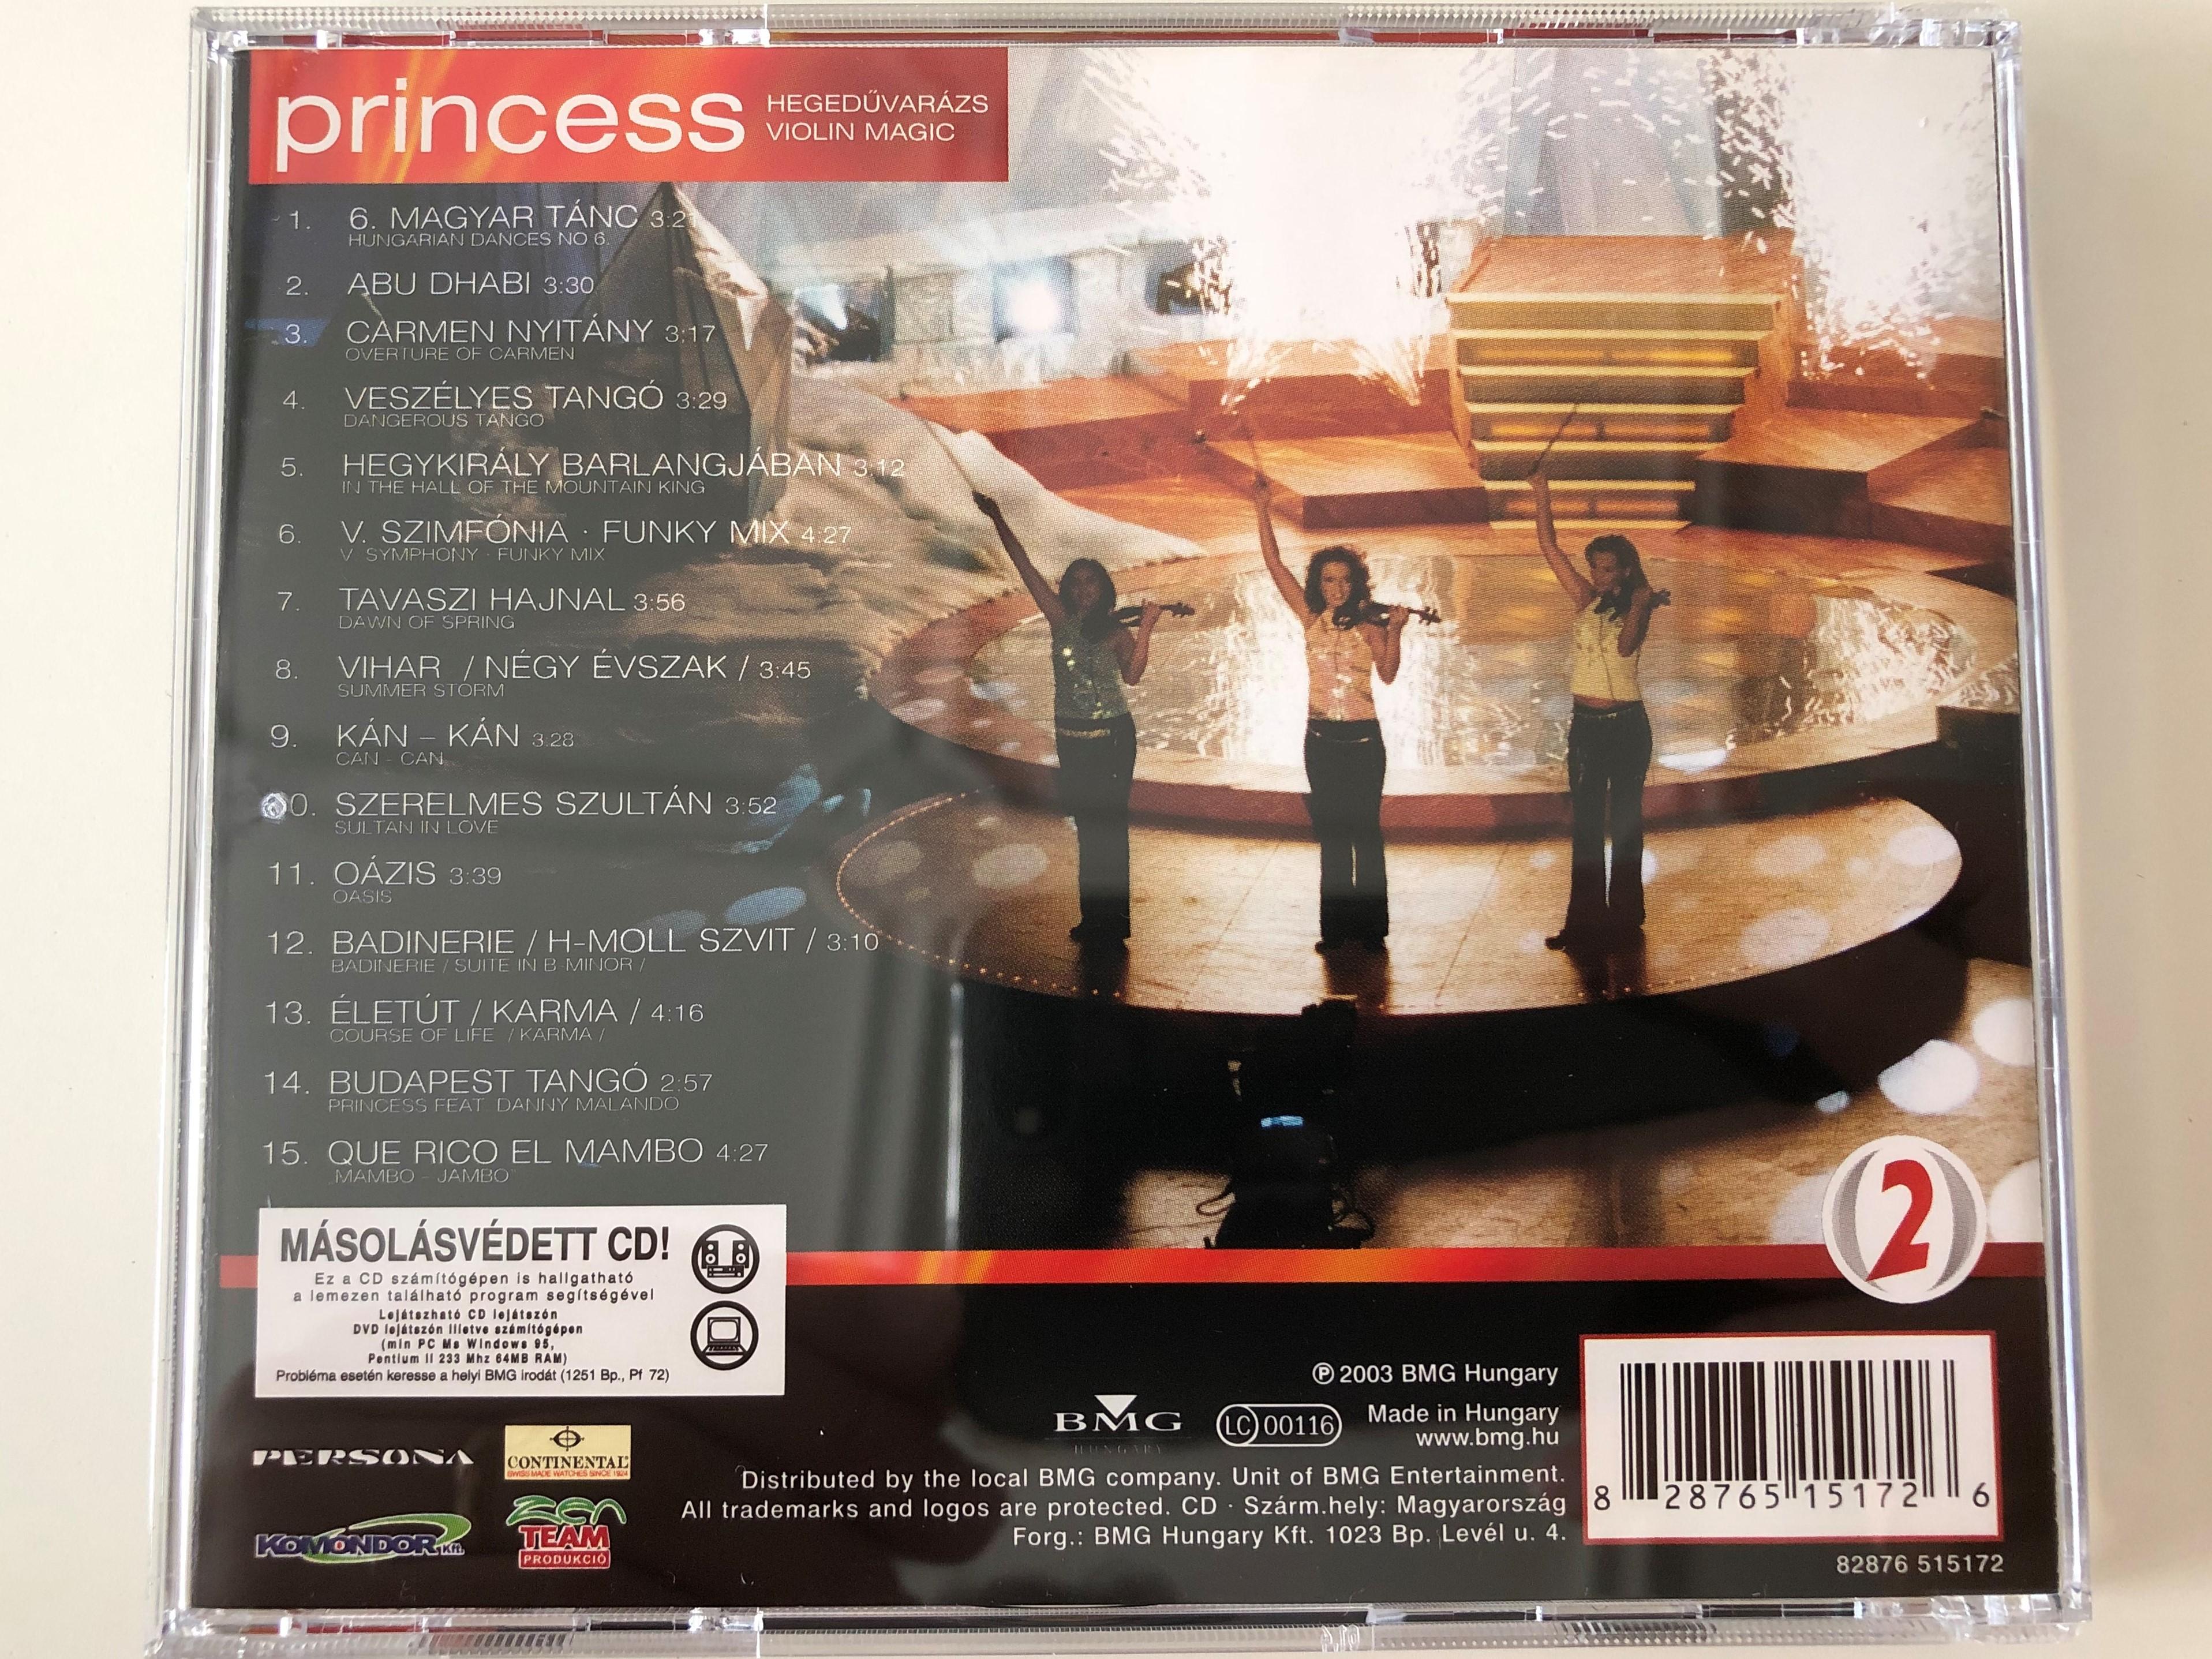 princess-heged-var-zs-violin-magic-bmg-hungary-audio-cd-2003-82876-515172-7-.jpg